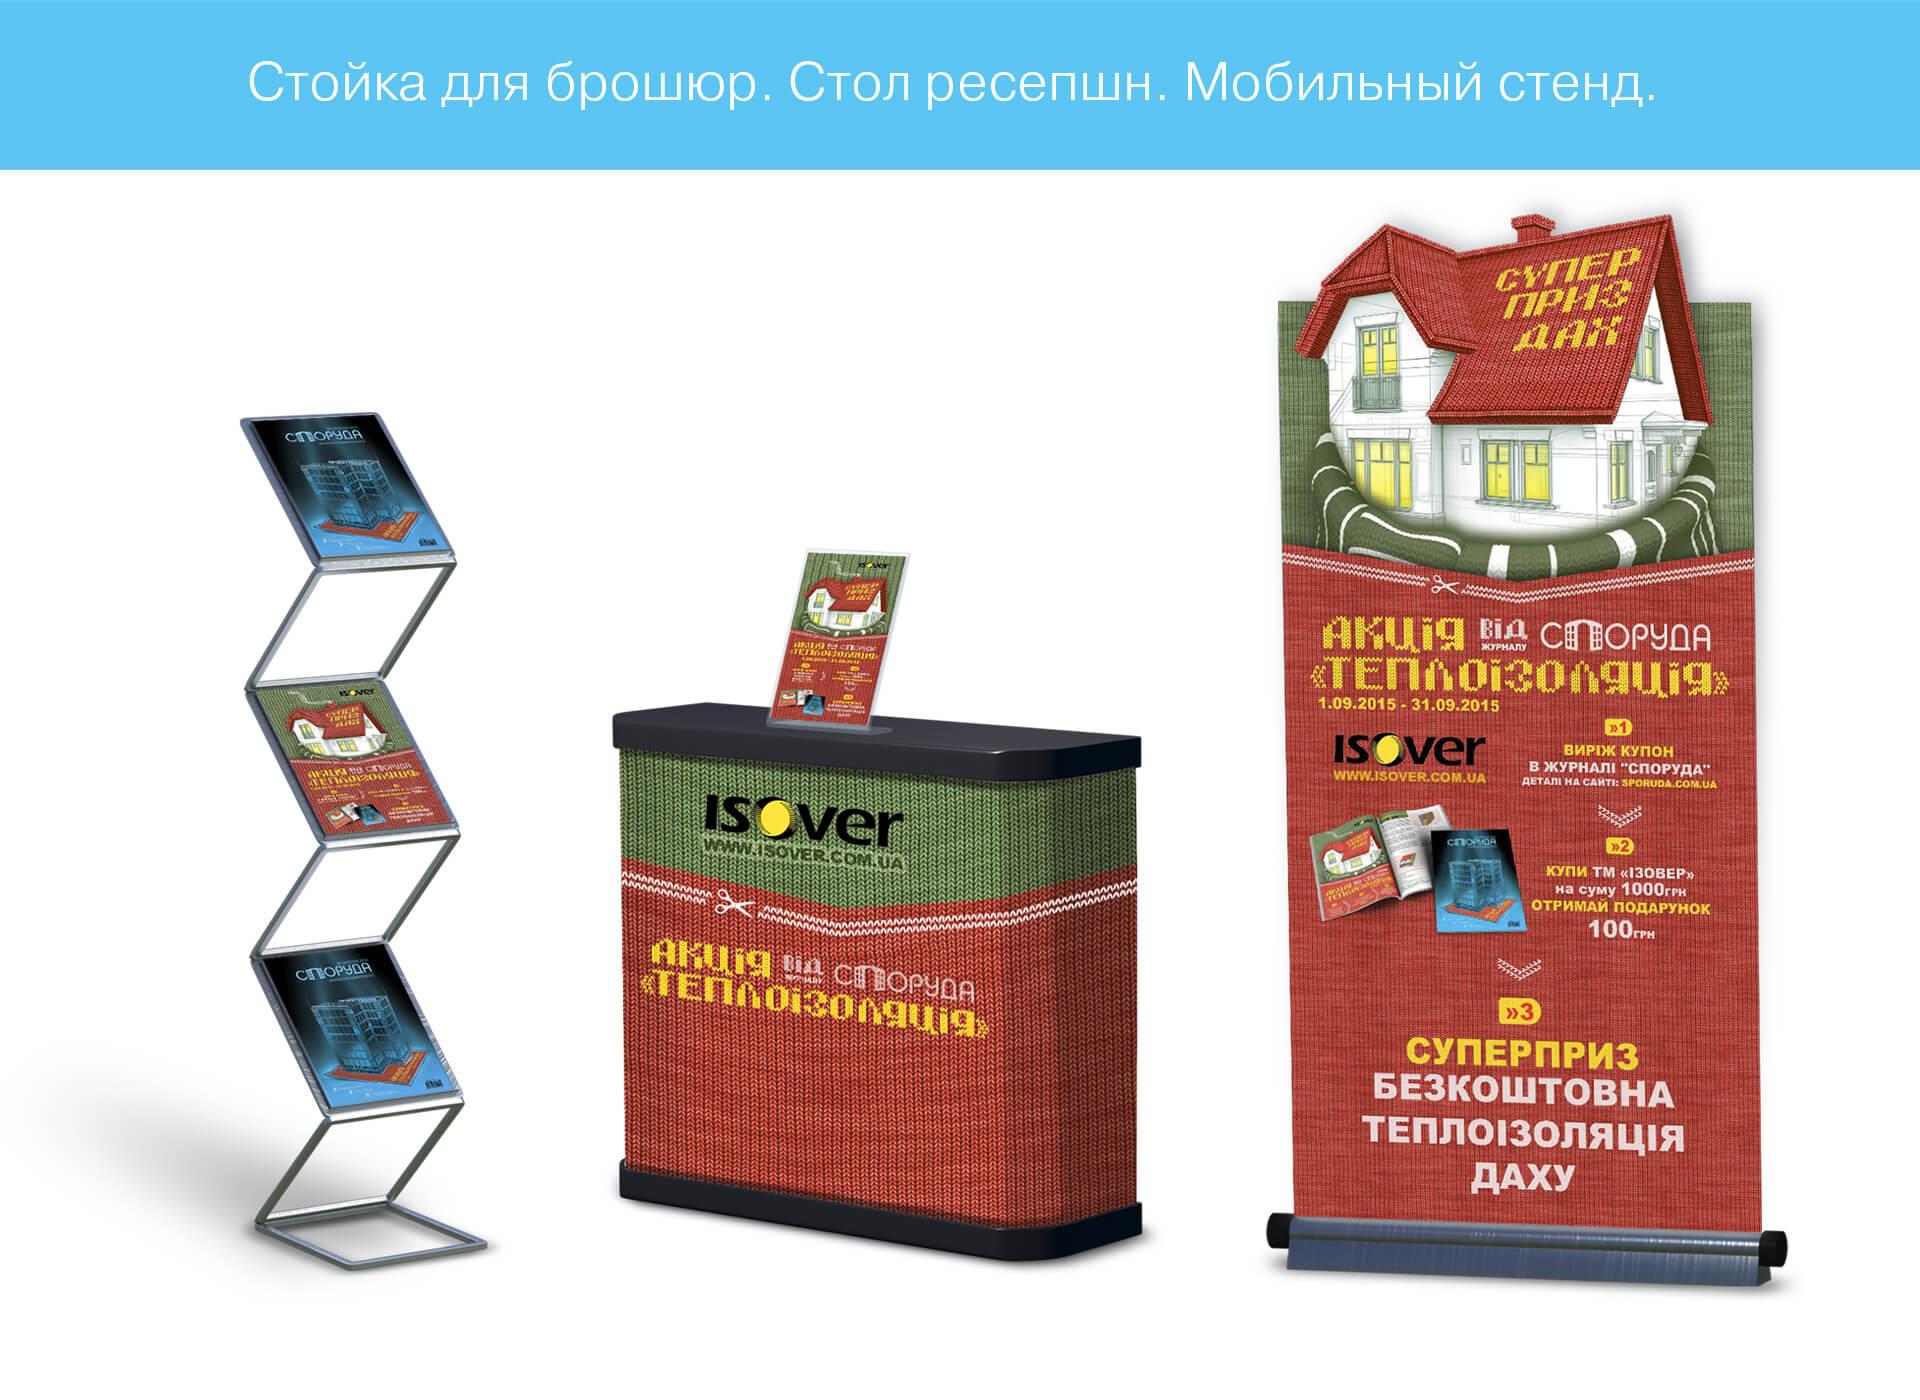 prokochuk_irina_architectural-magazine-sporuda_advertising-campaign_2